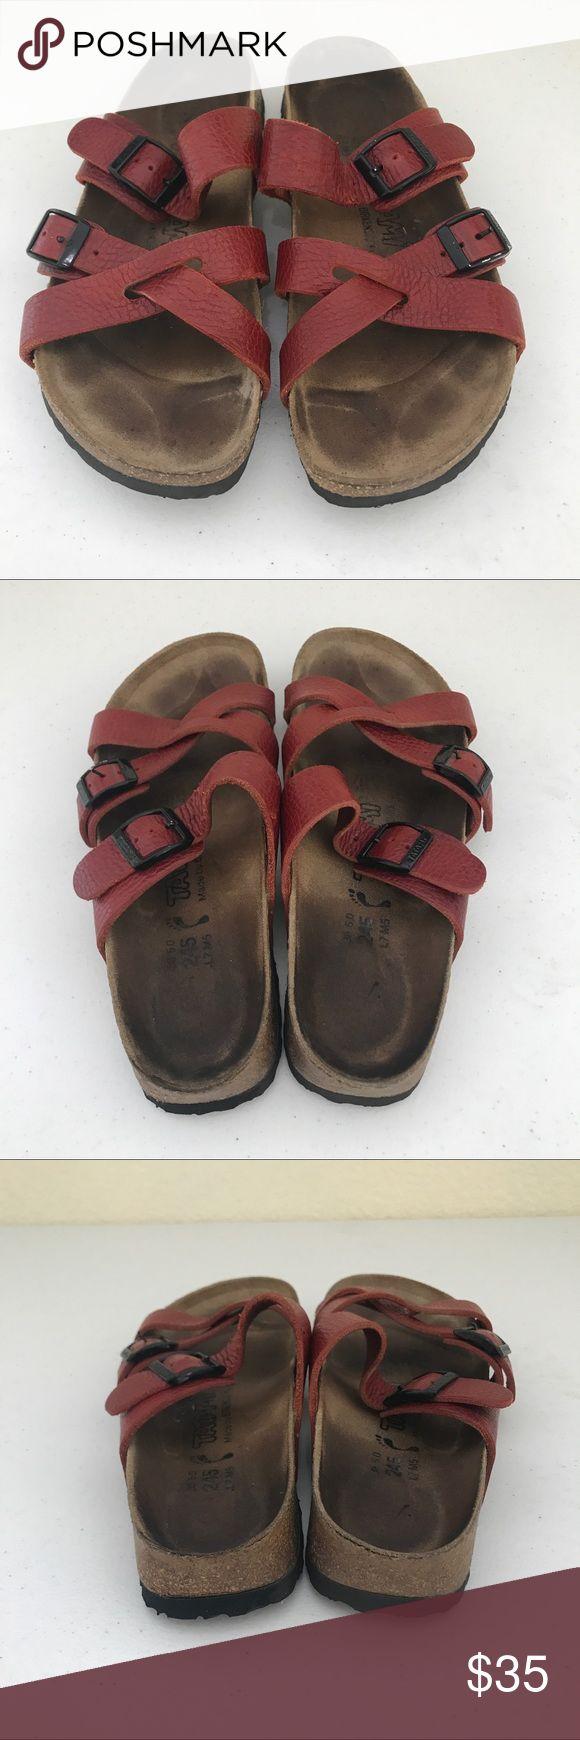 ⭐️⭐️Tatami by Birkenstocks Used Tatami by Birkenstocks size 38 Shoes Sandals